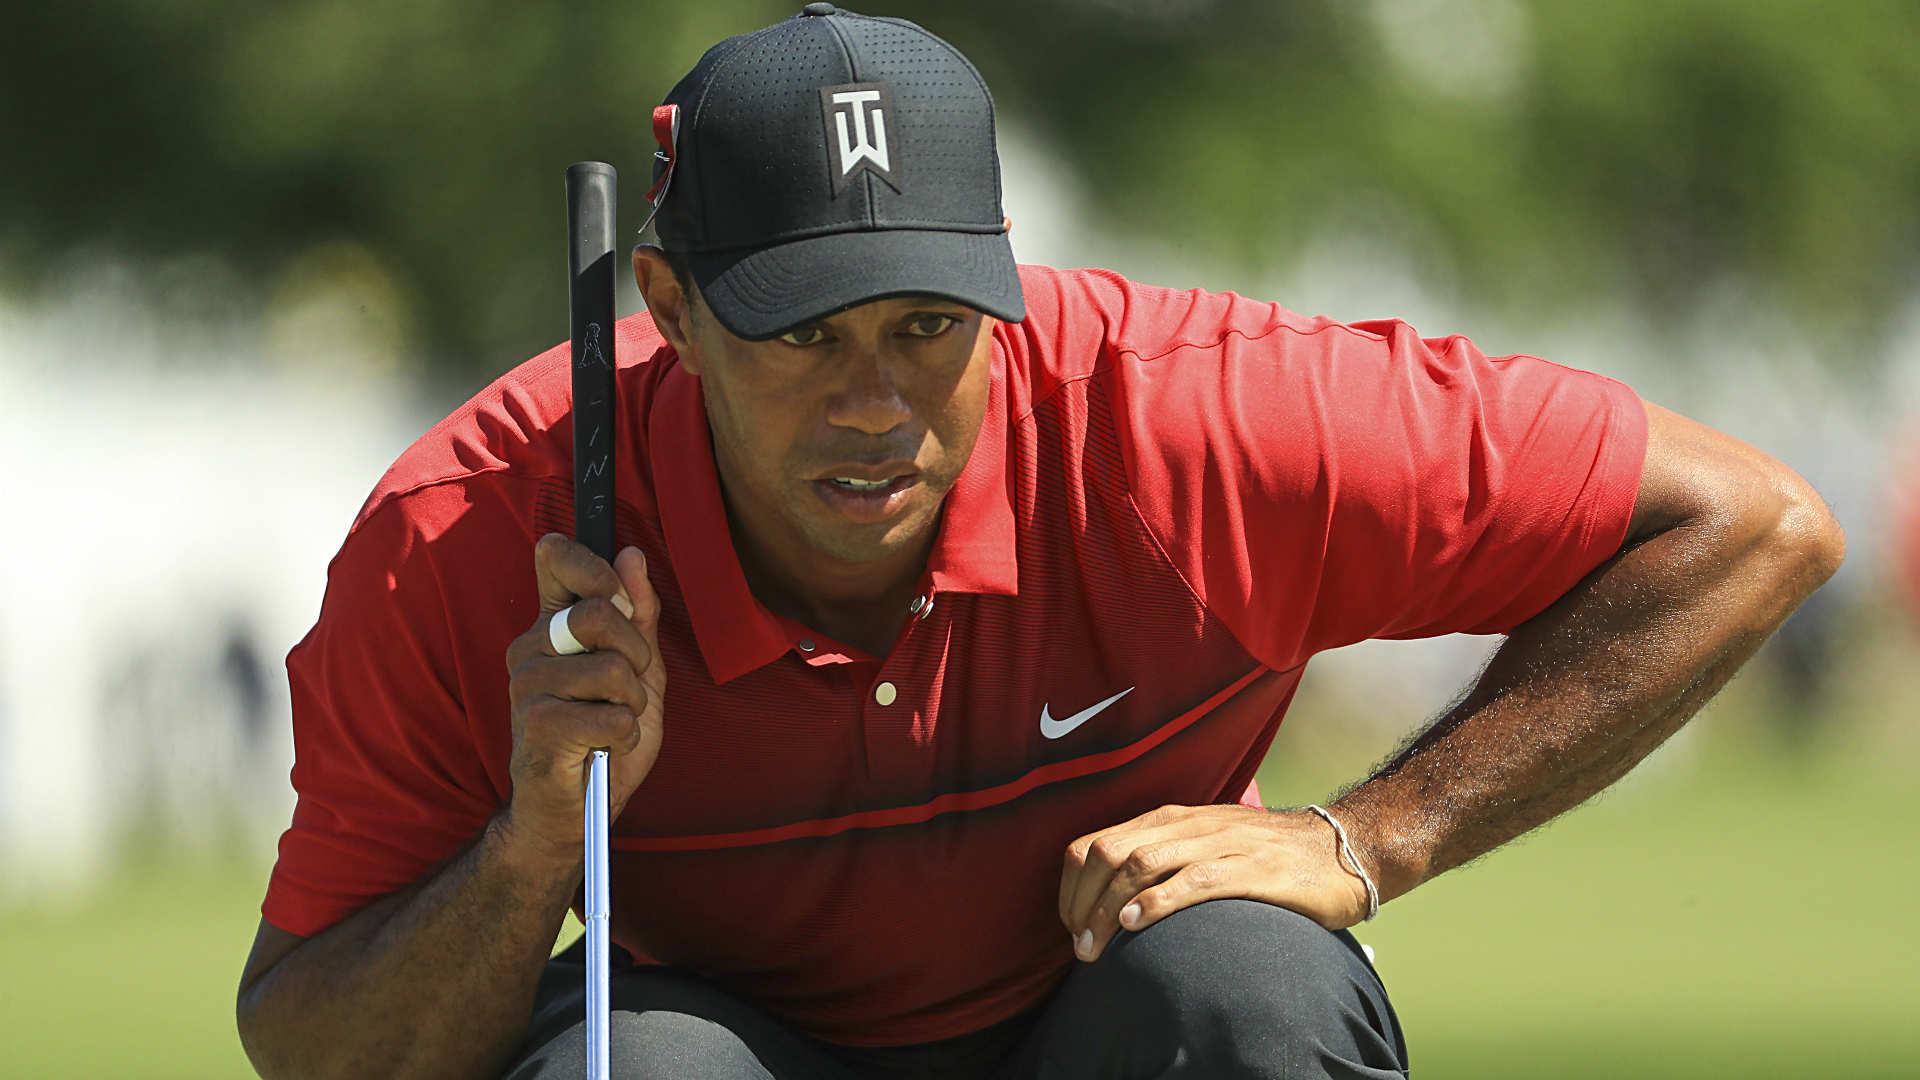 Tiger-Woods-022718-Getty-FTR.jpg